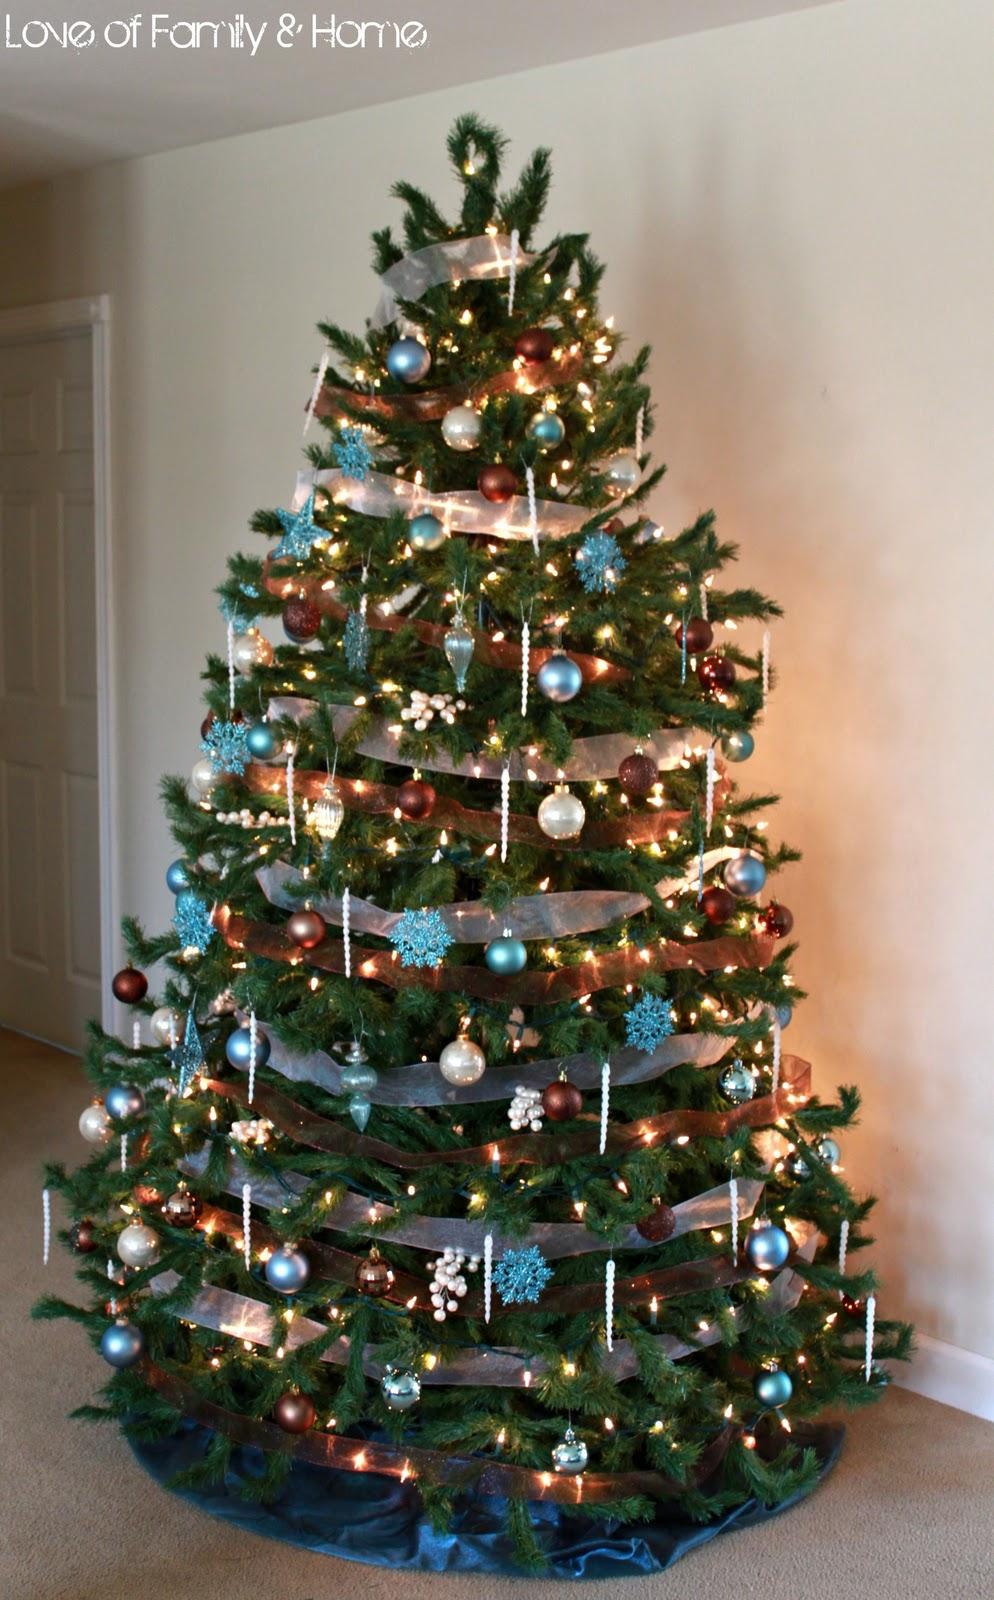 My Christmas Tree 2011 - Love of Family & Home